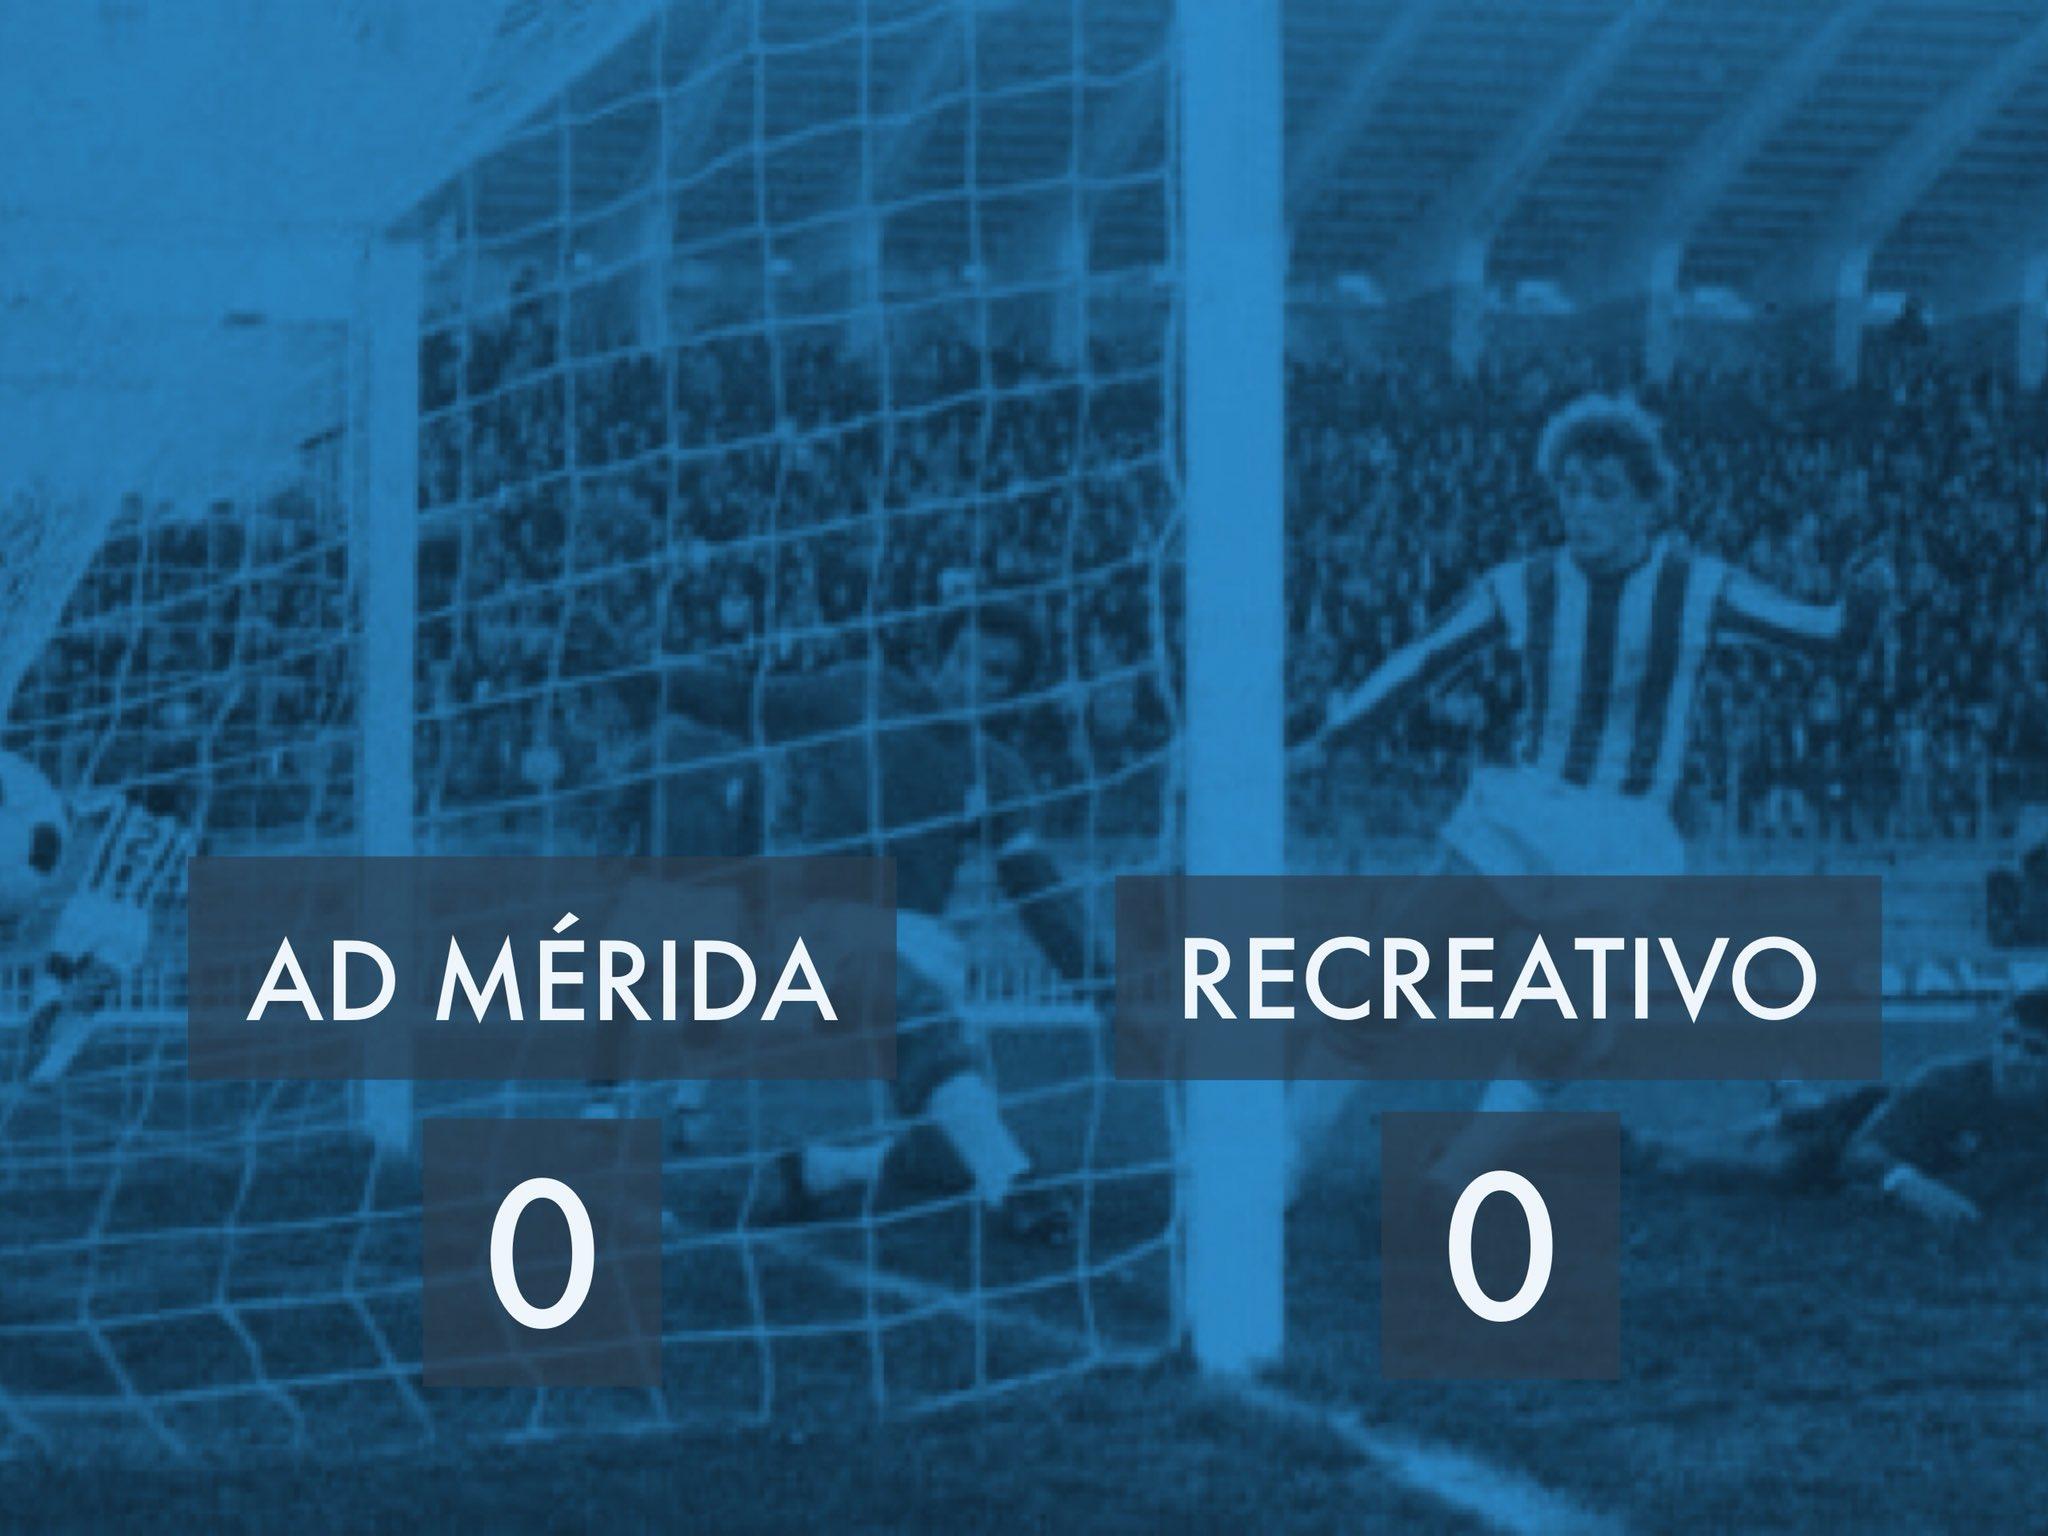 AD MERIDA 0-RECRE 0 PRESENTACION MERIDA 18/19 AMISTOSO Dkobtm10